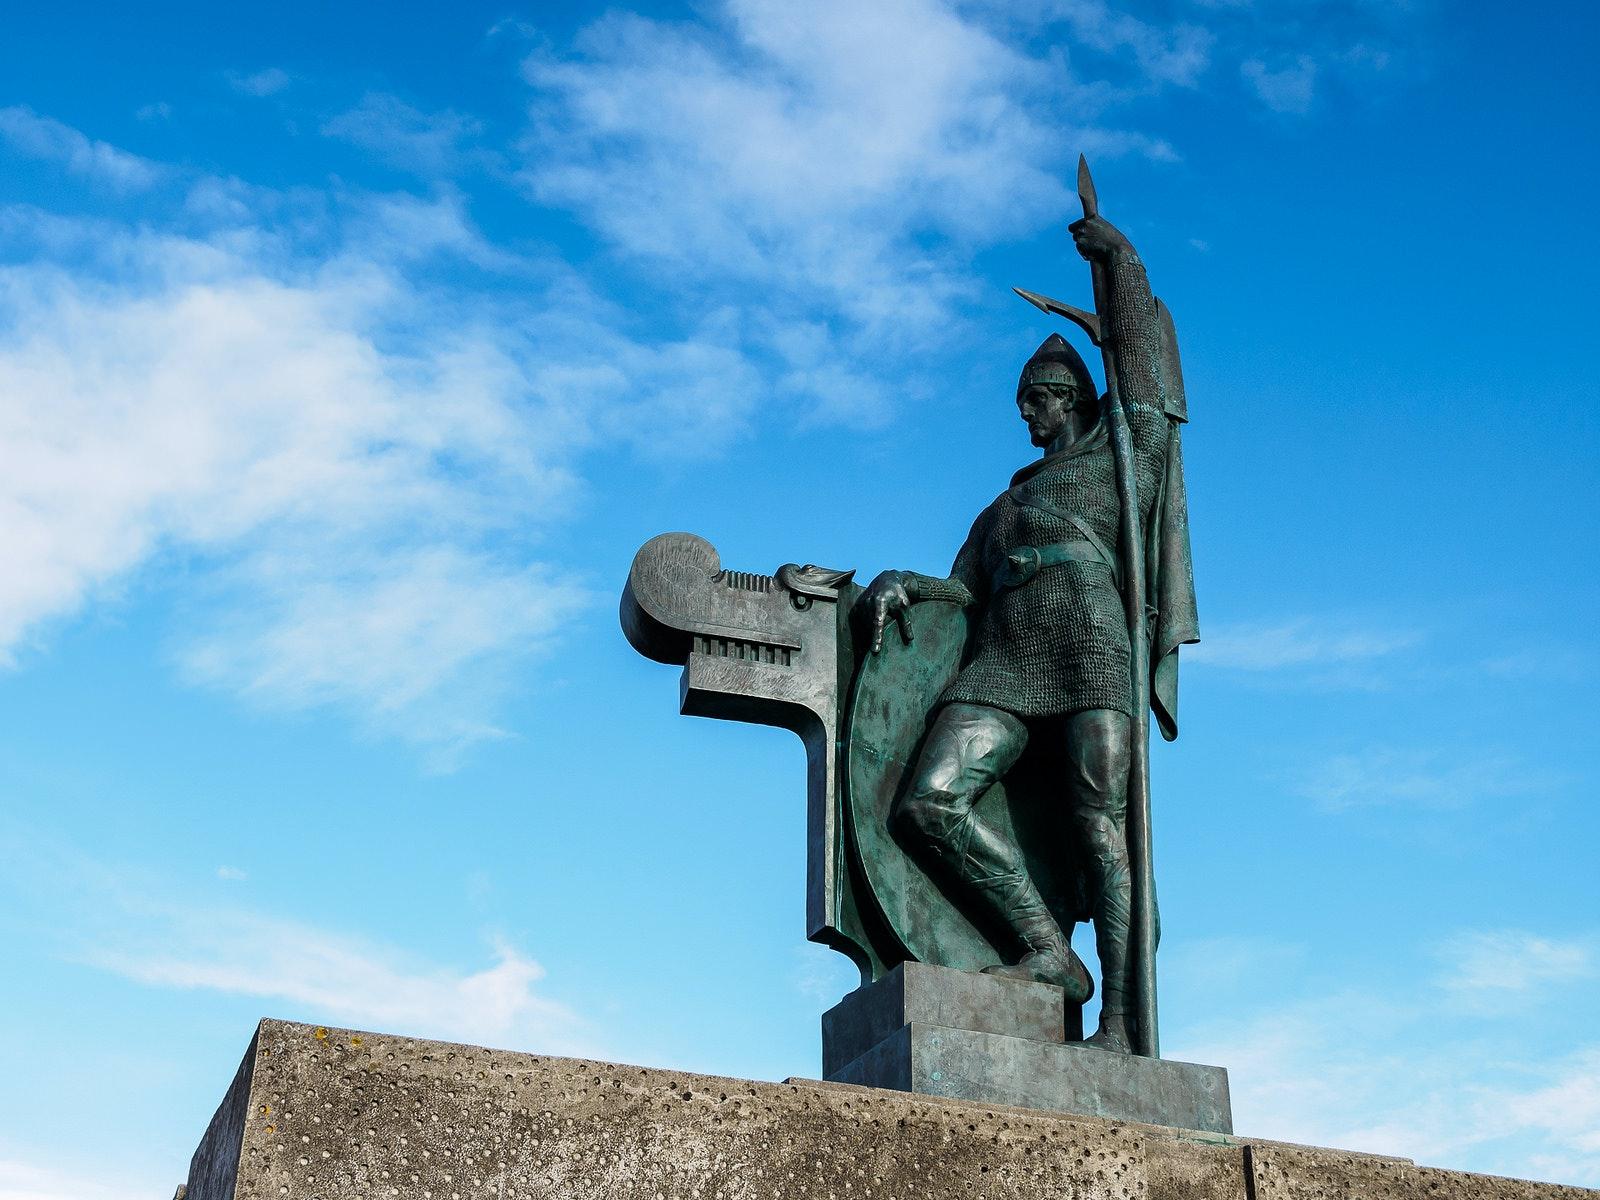 This statue of Ingólfur Arnason is on the hill Árnarhóll, which overlooks Reykjavík's downtown.